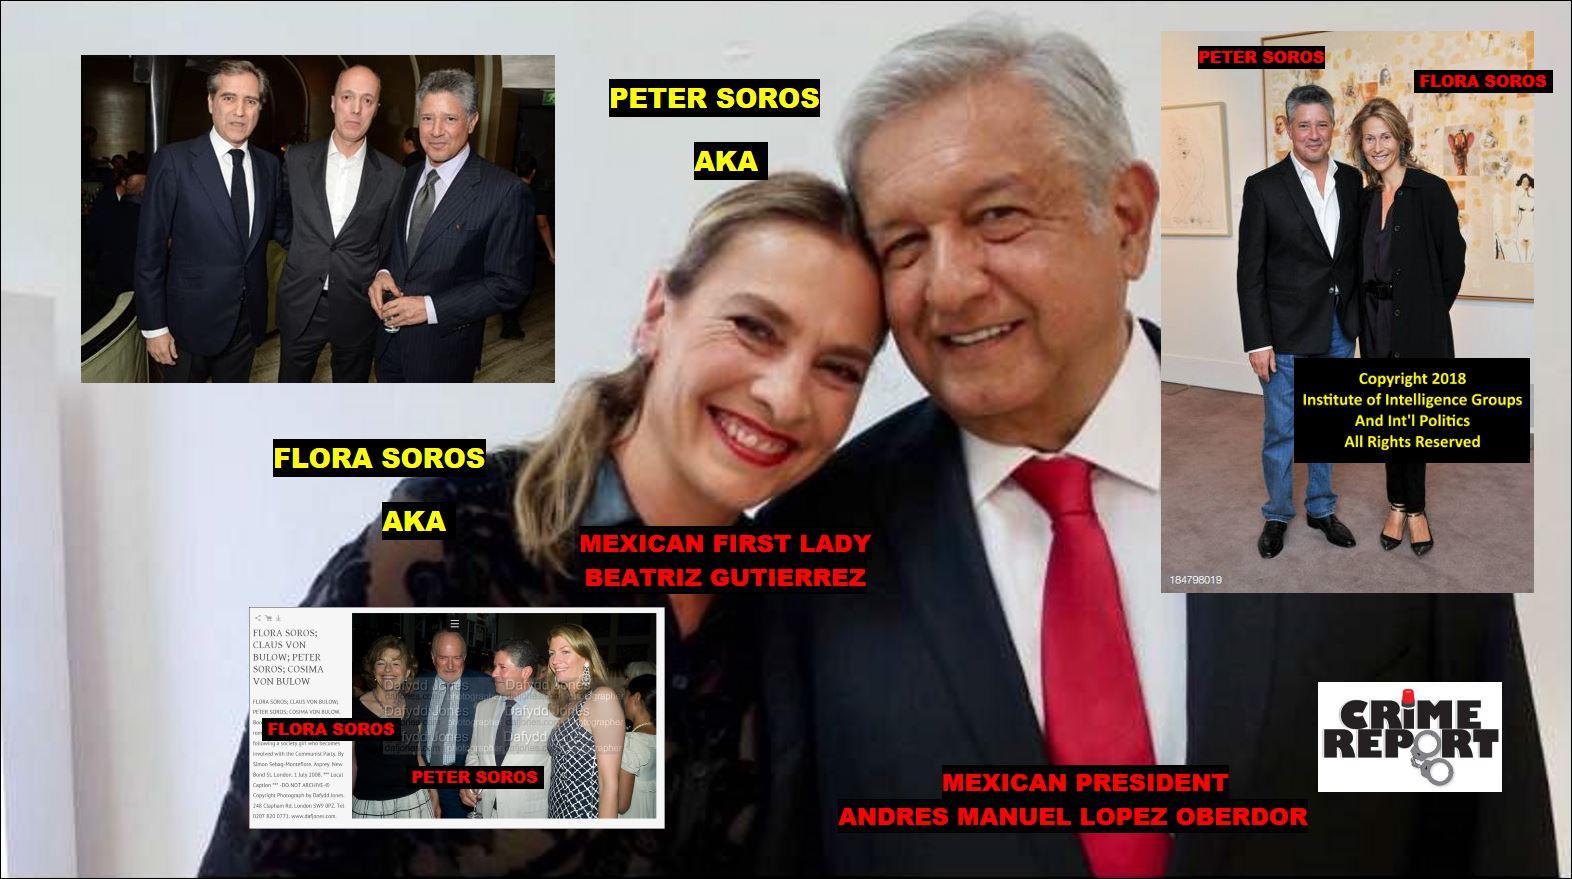 PETER SOROS AND FLORA SOROS.JPG